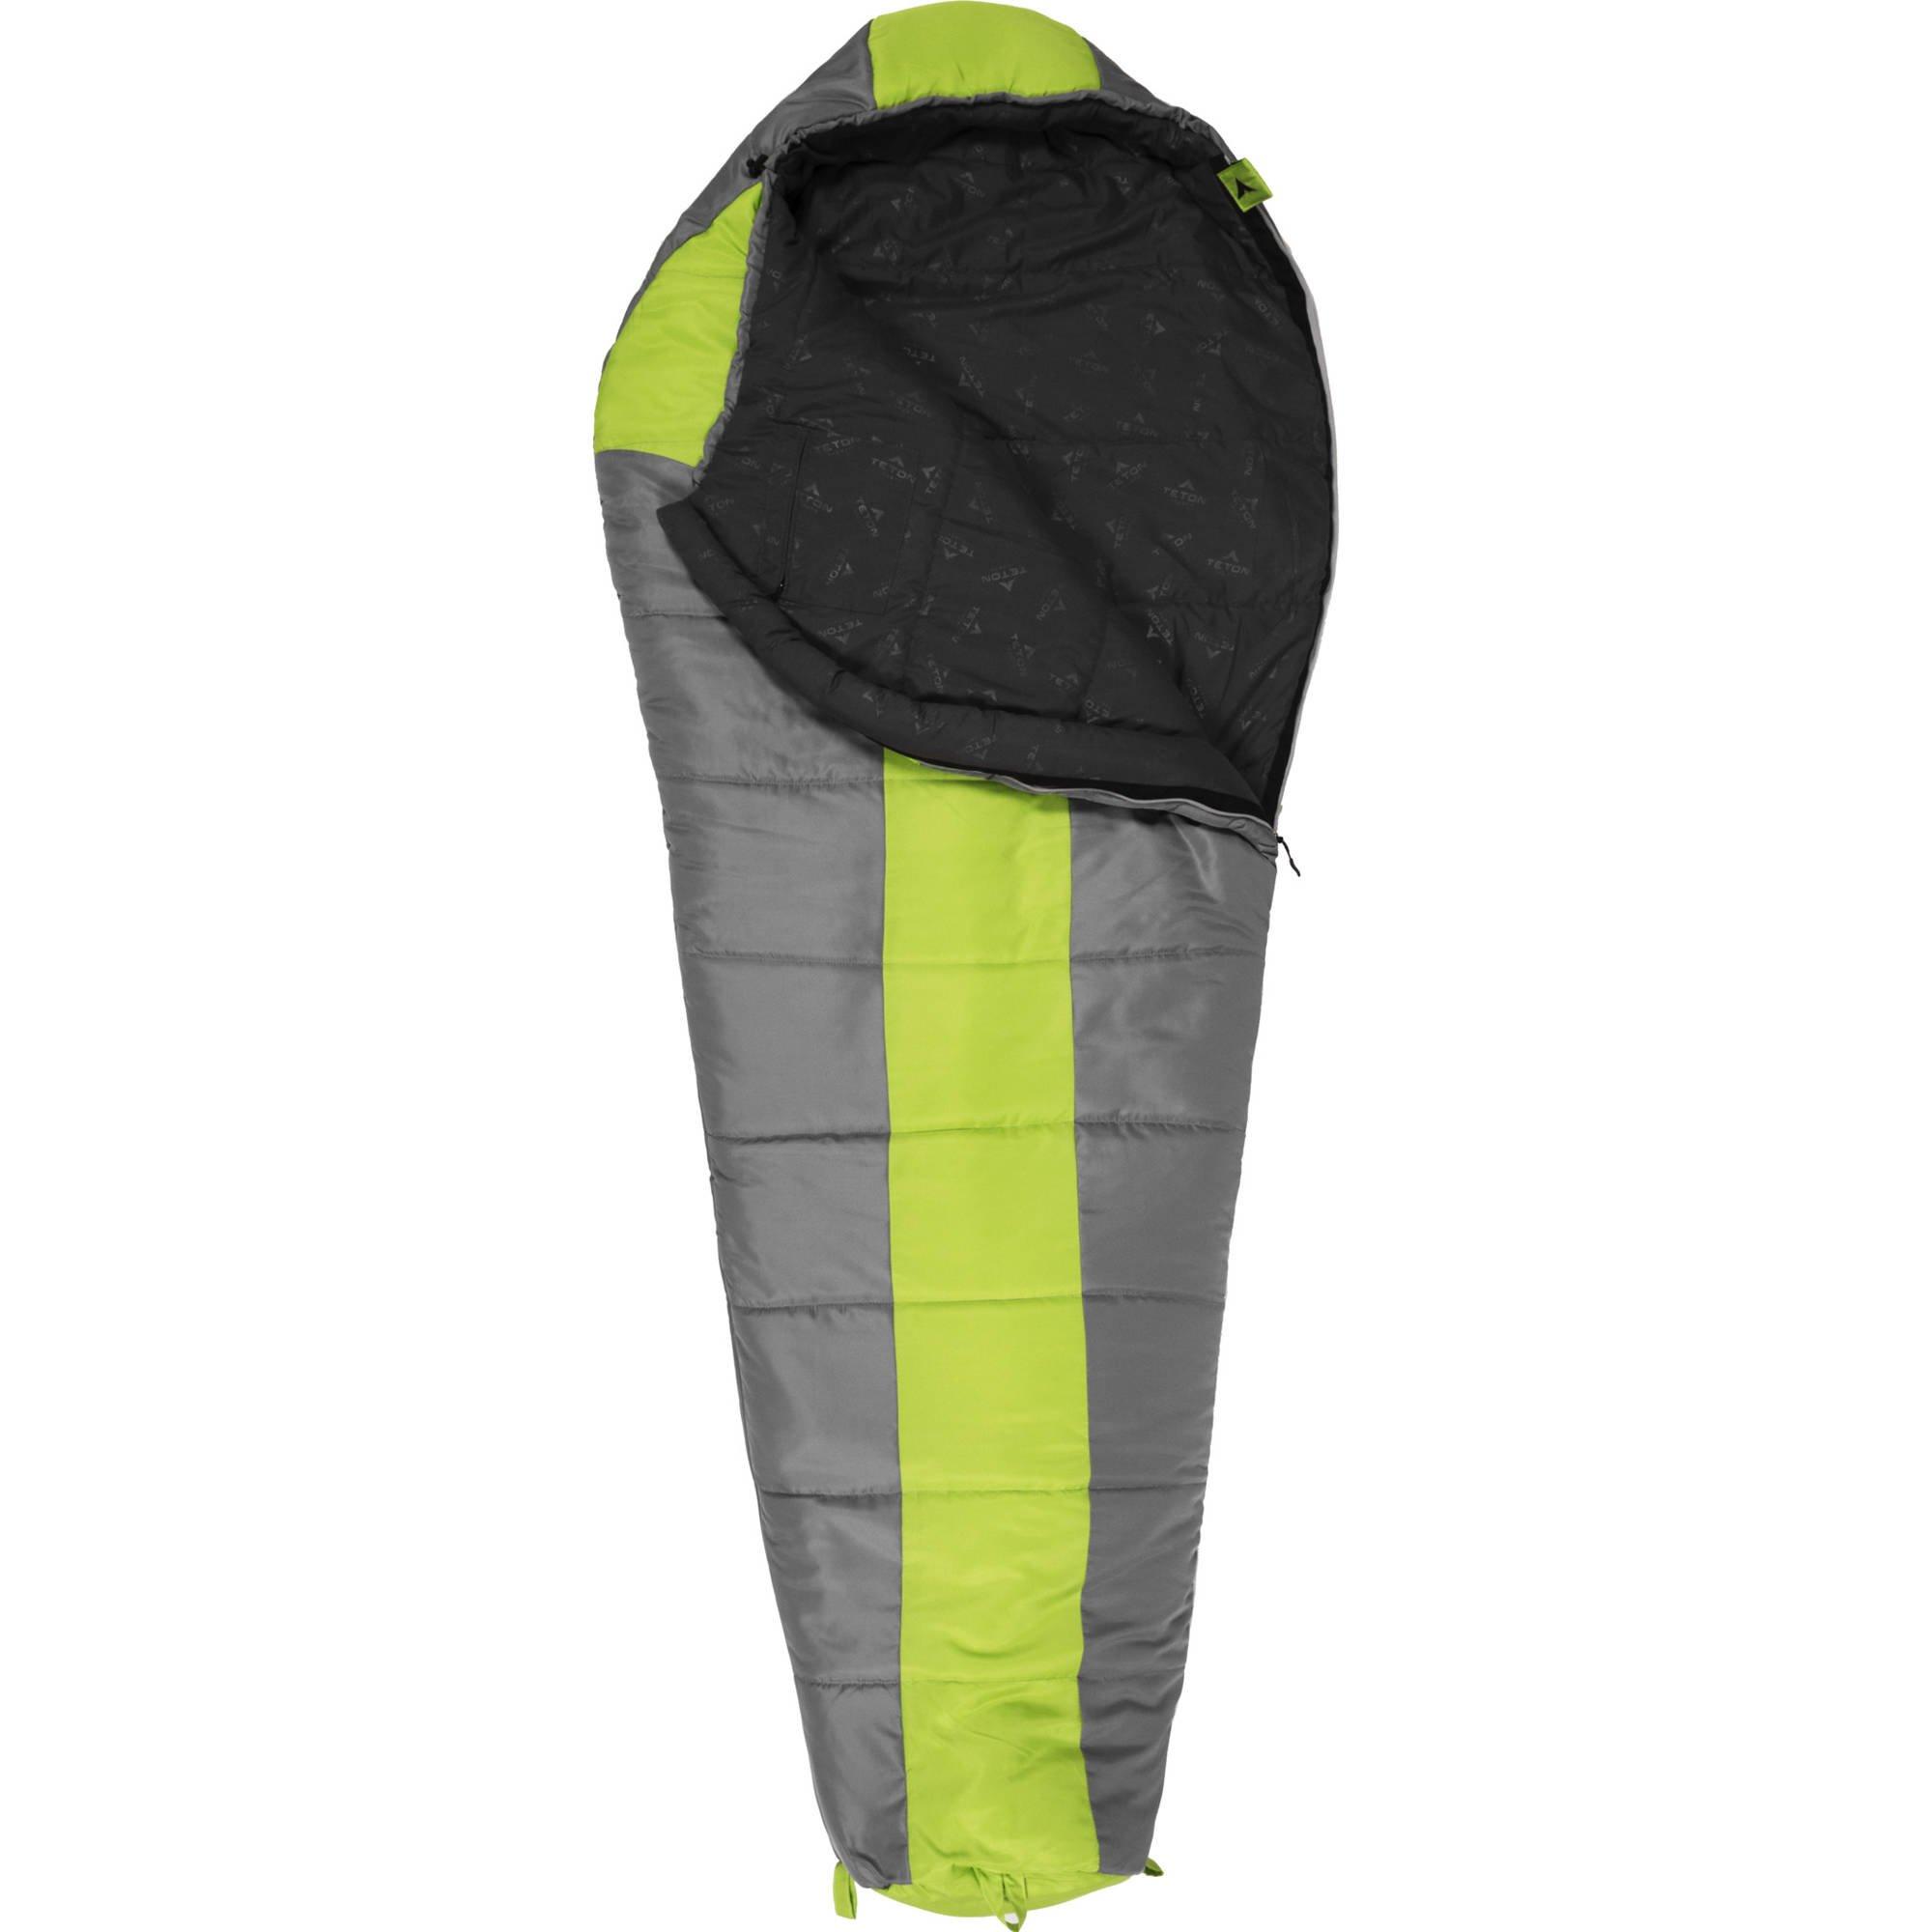 TETON Sports Tracker 5 Lightweight Mummy Sleeping Bag